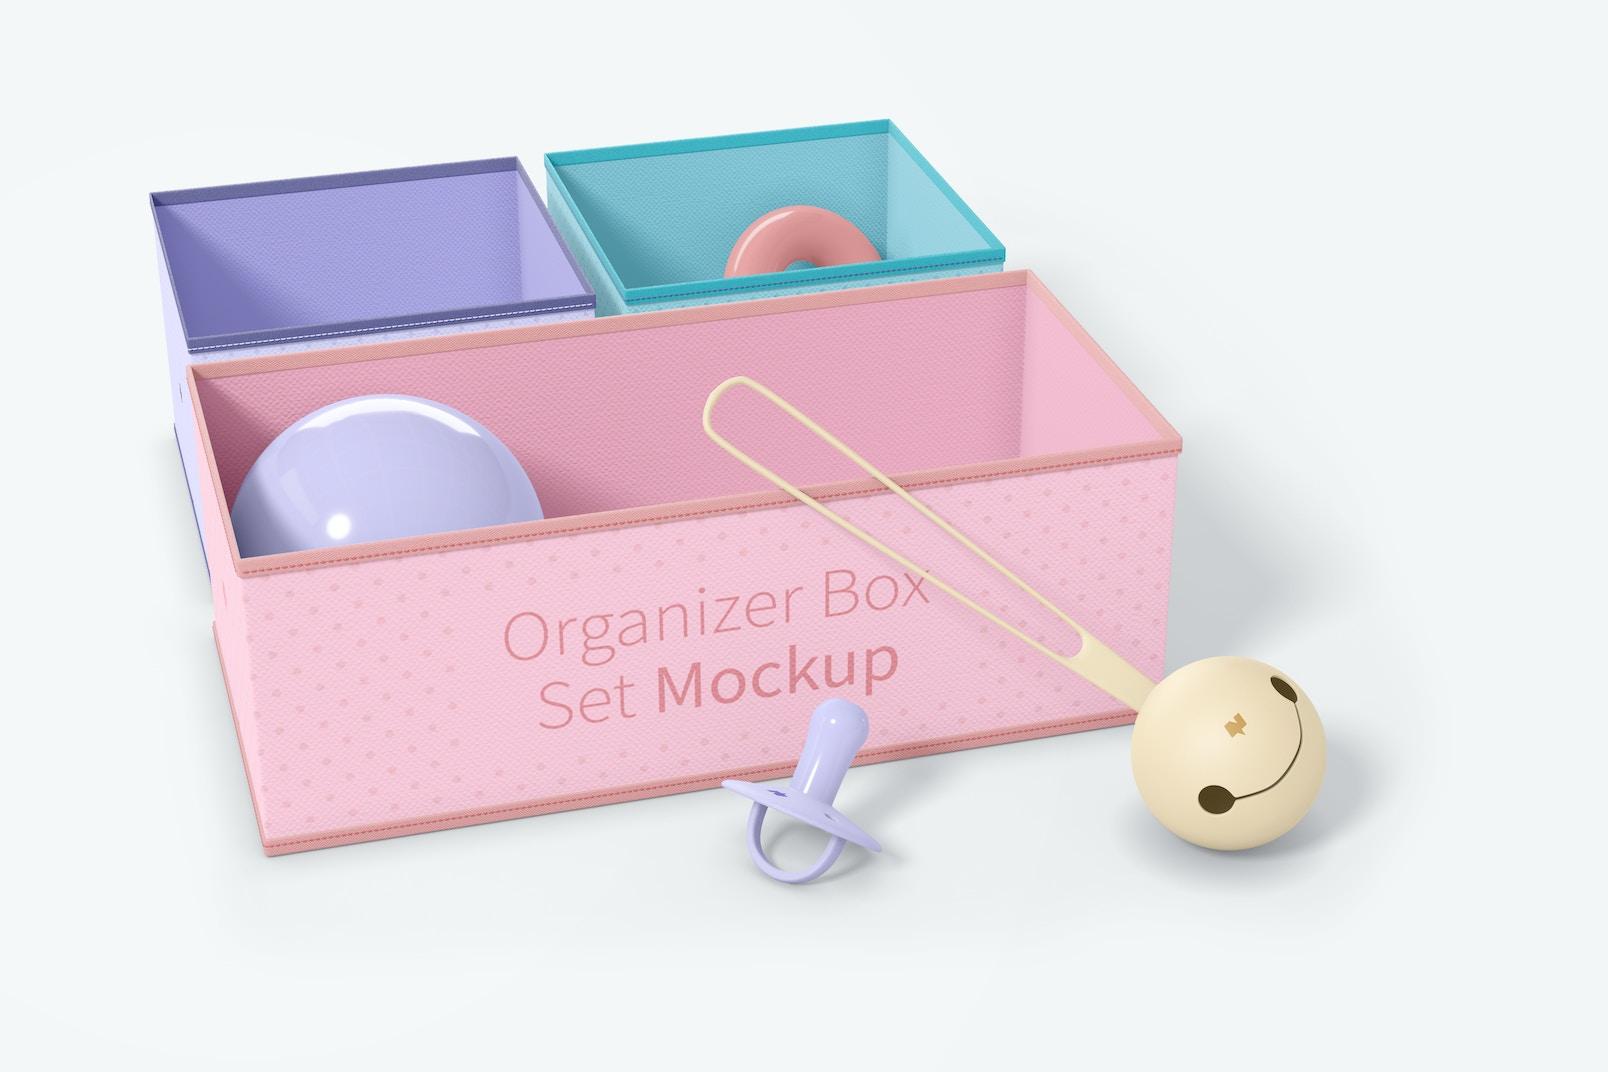 Fabric Organizer Box Set Mockup, Front View